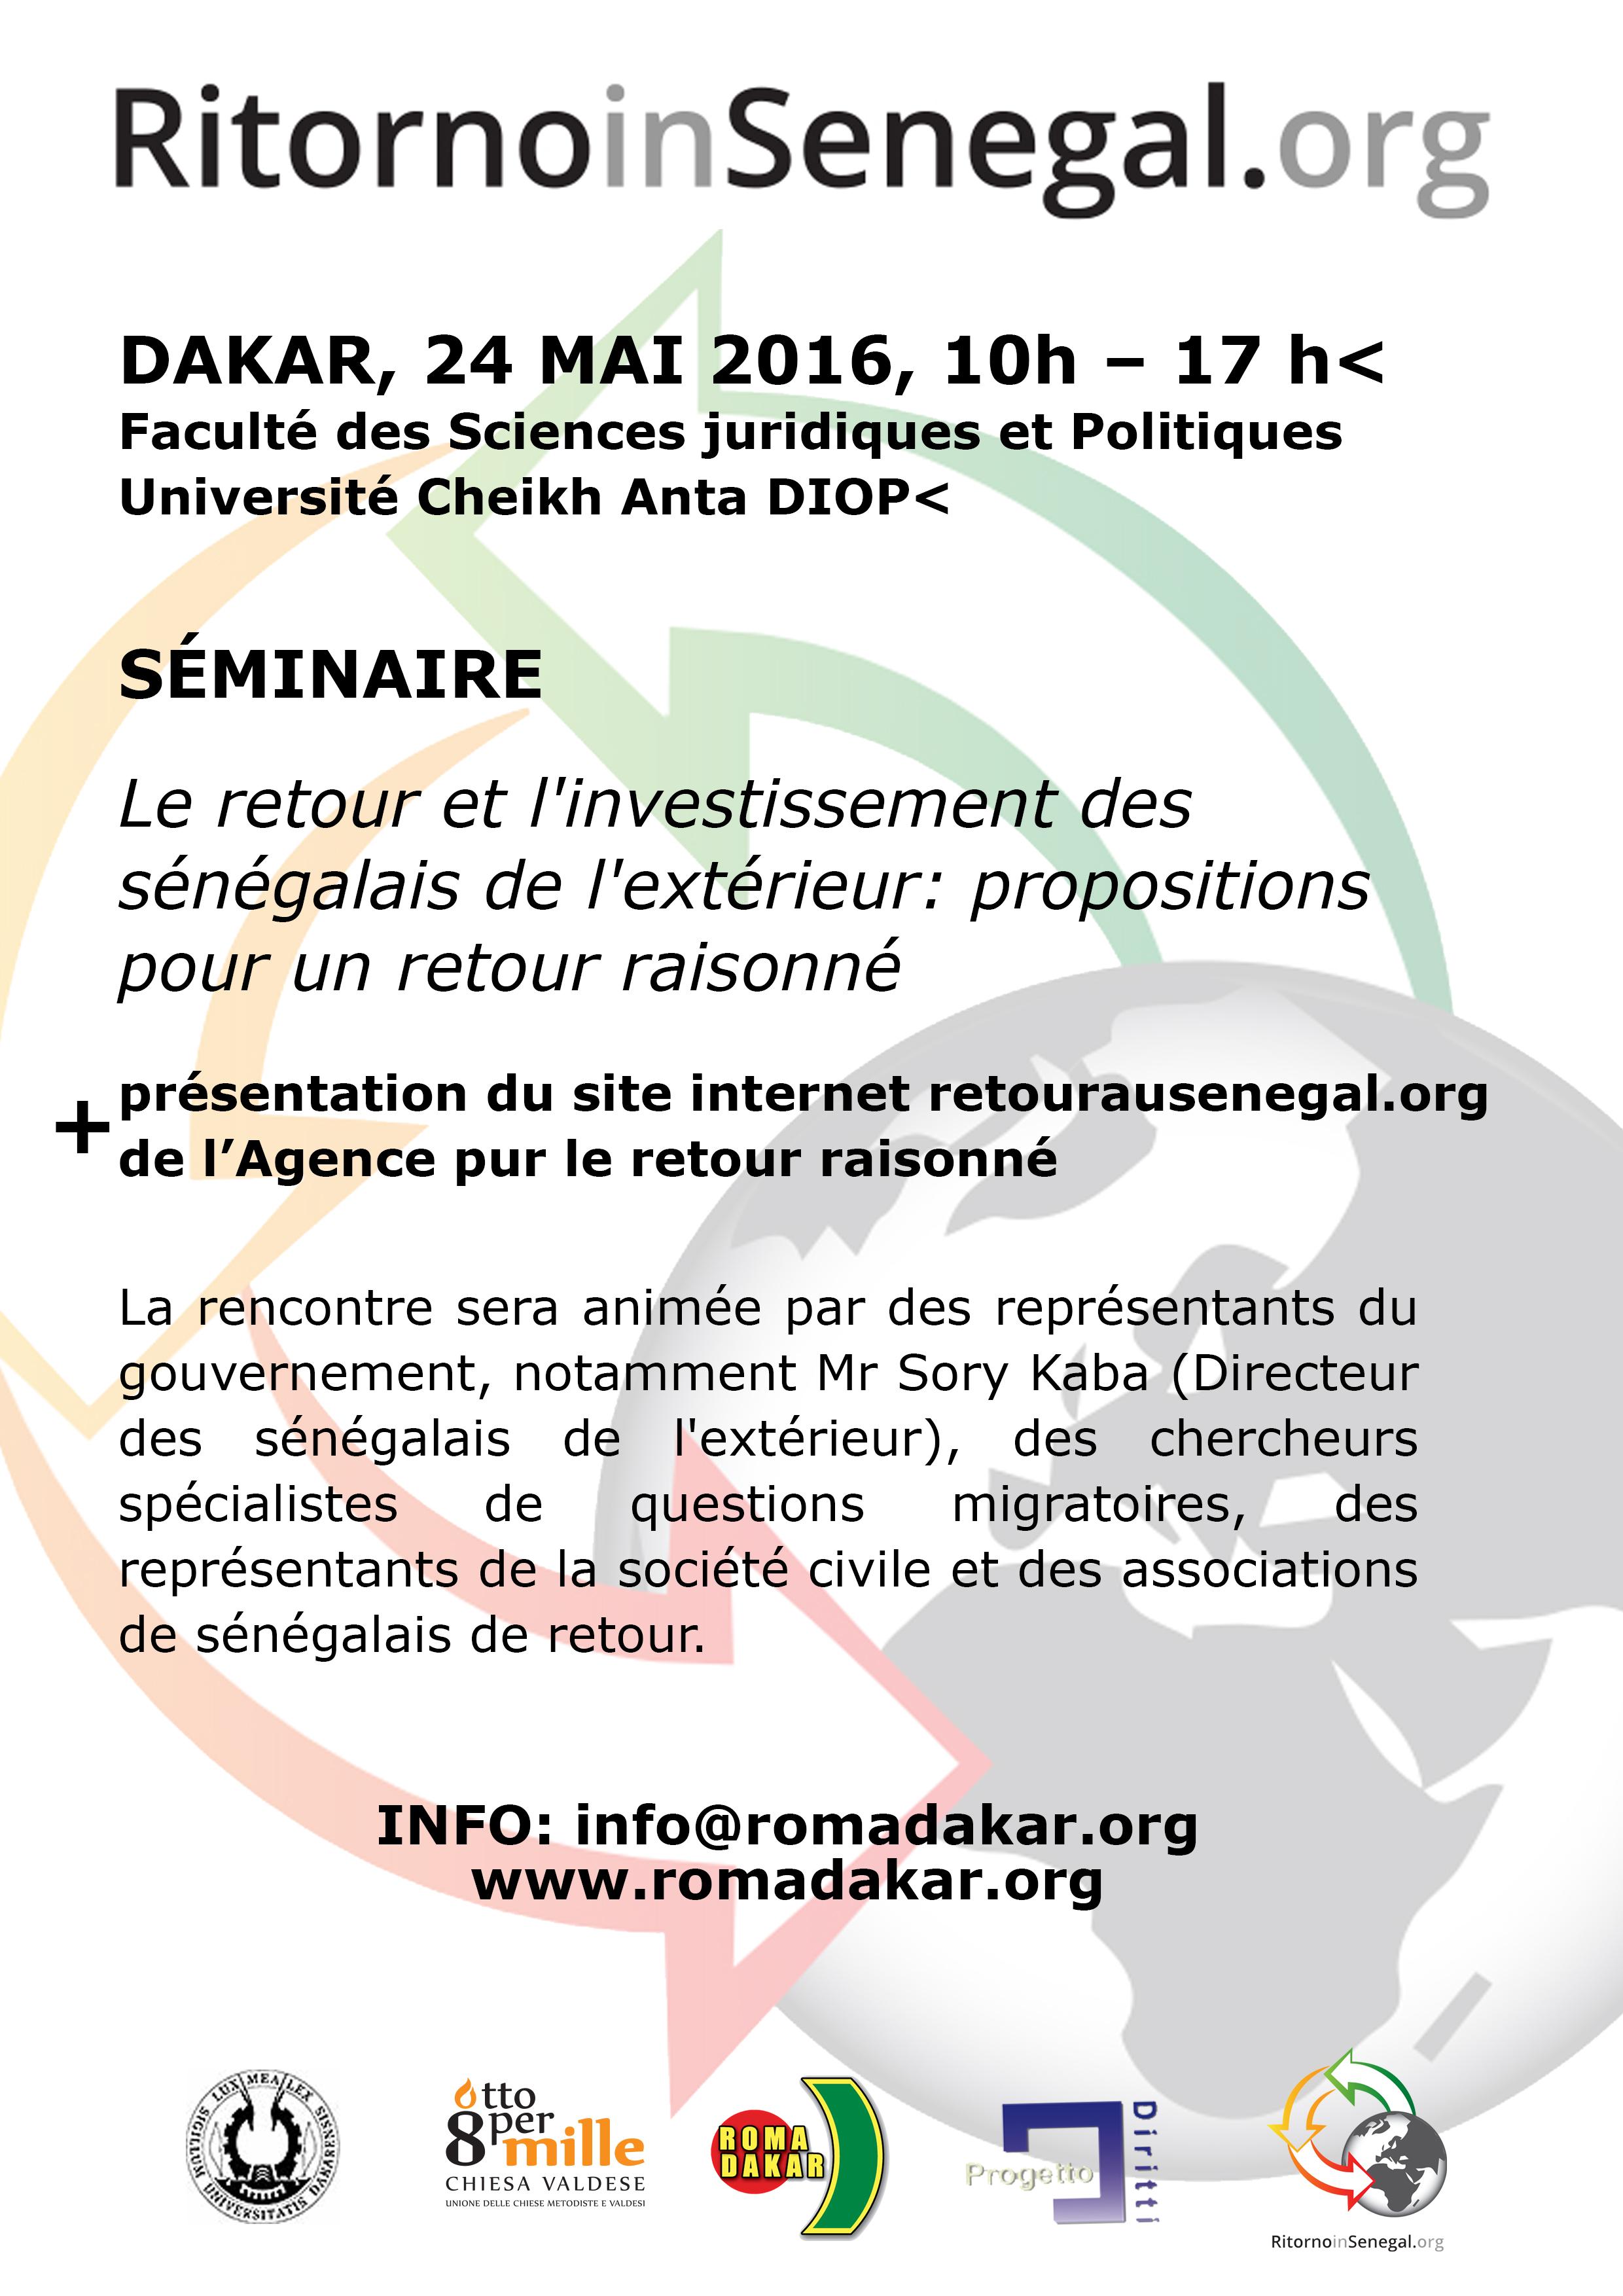 ritornoinsenegal_Dakar